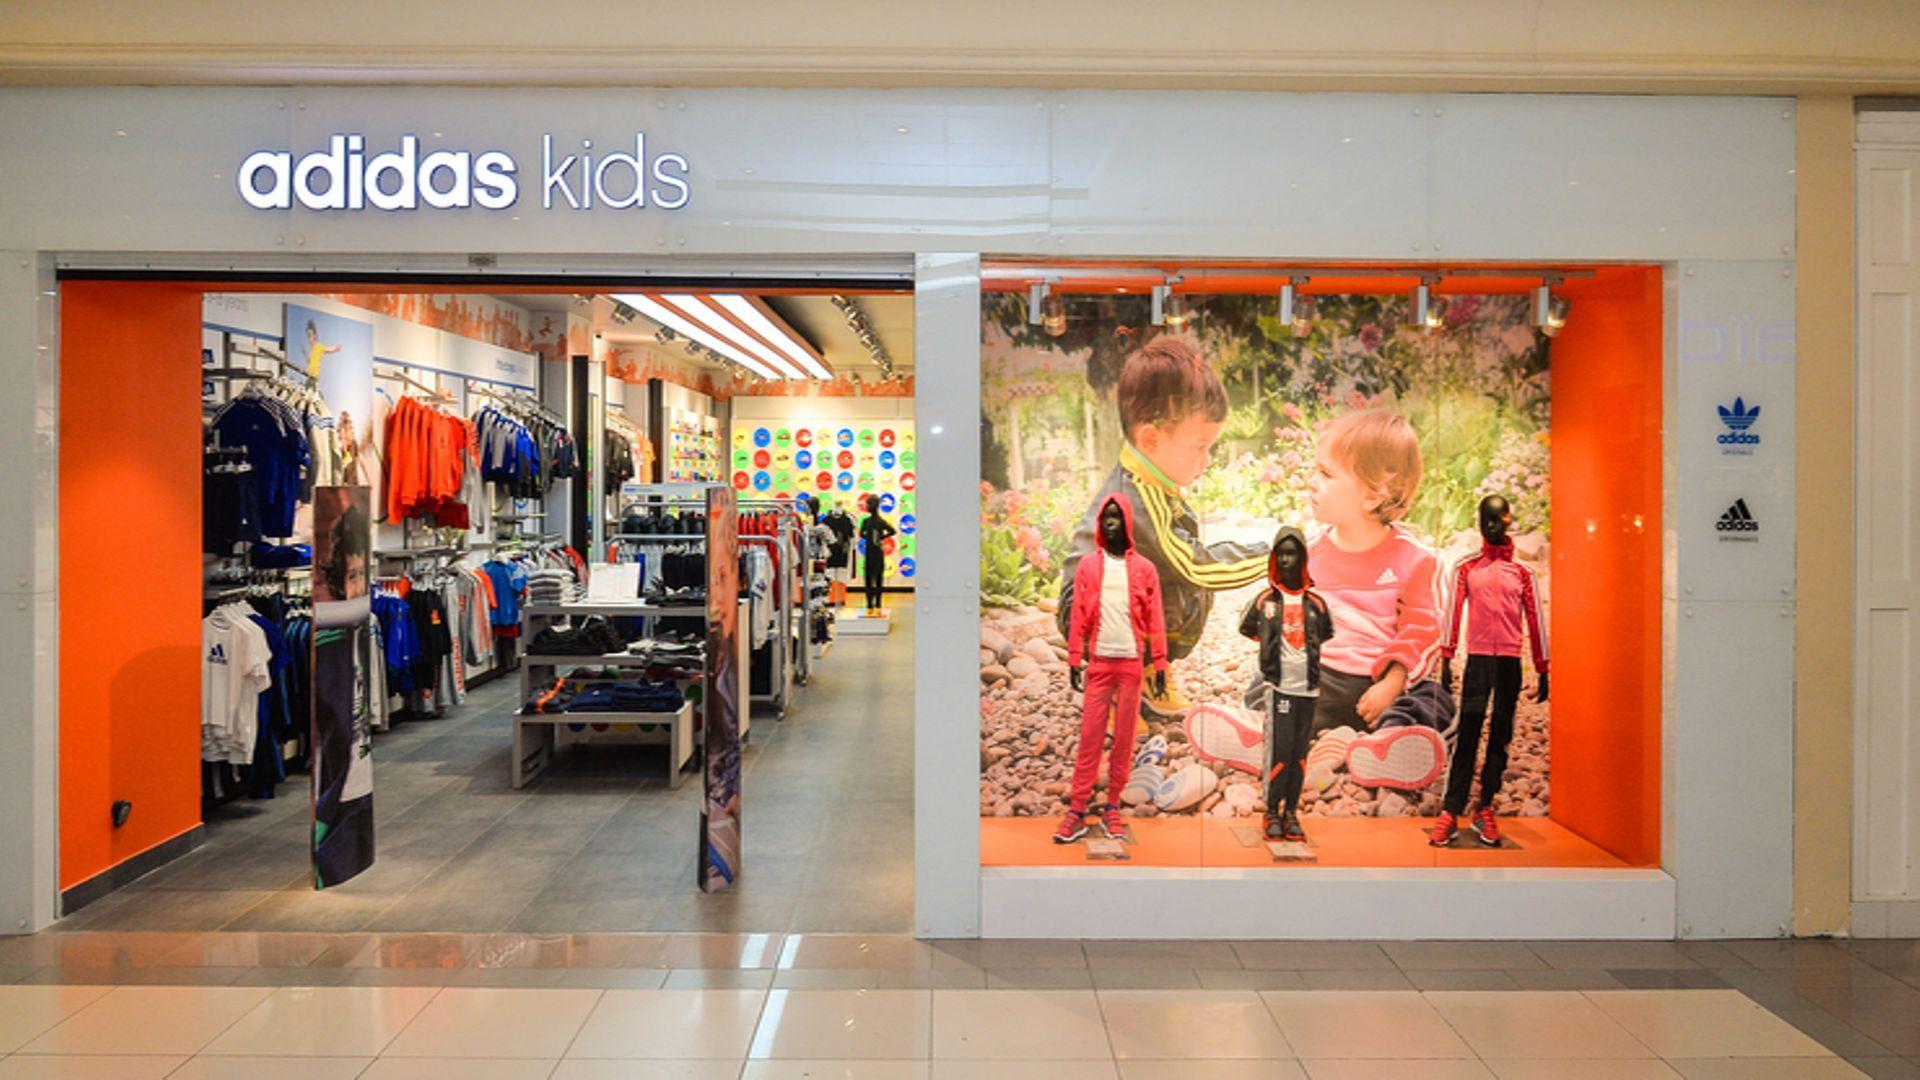 adidas kids apparel off 54% - www.ncccc